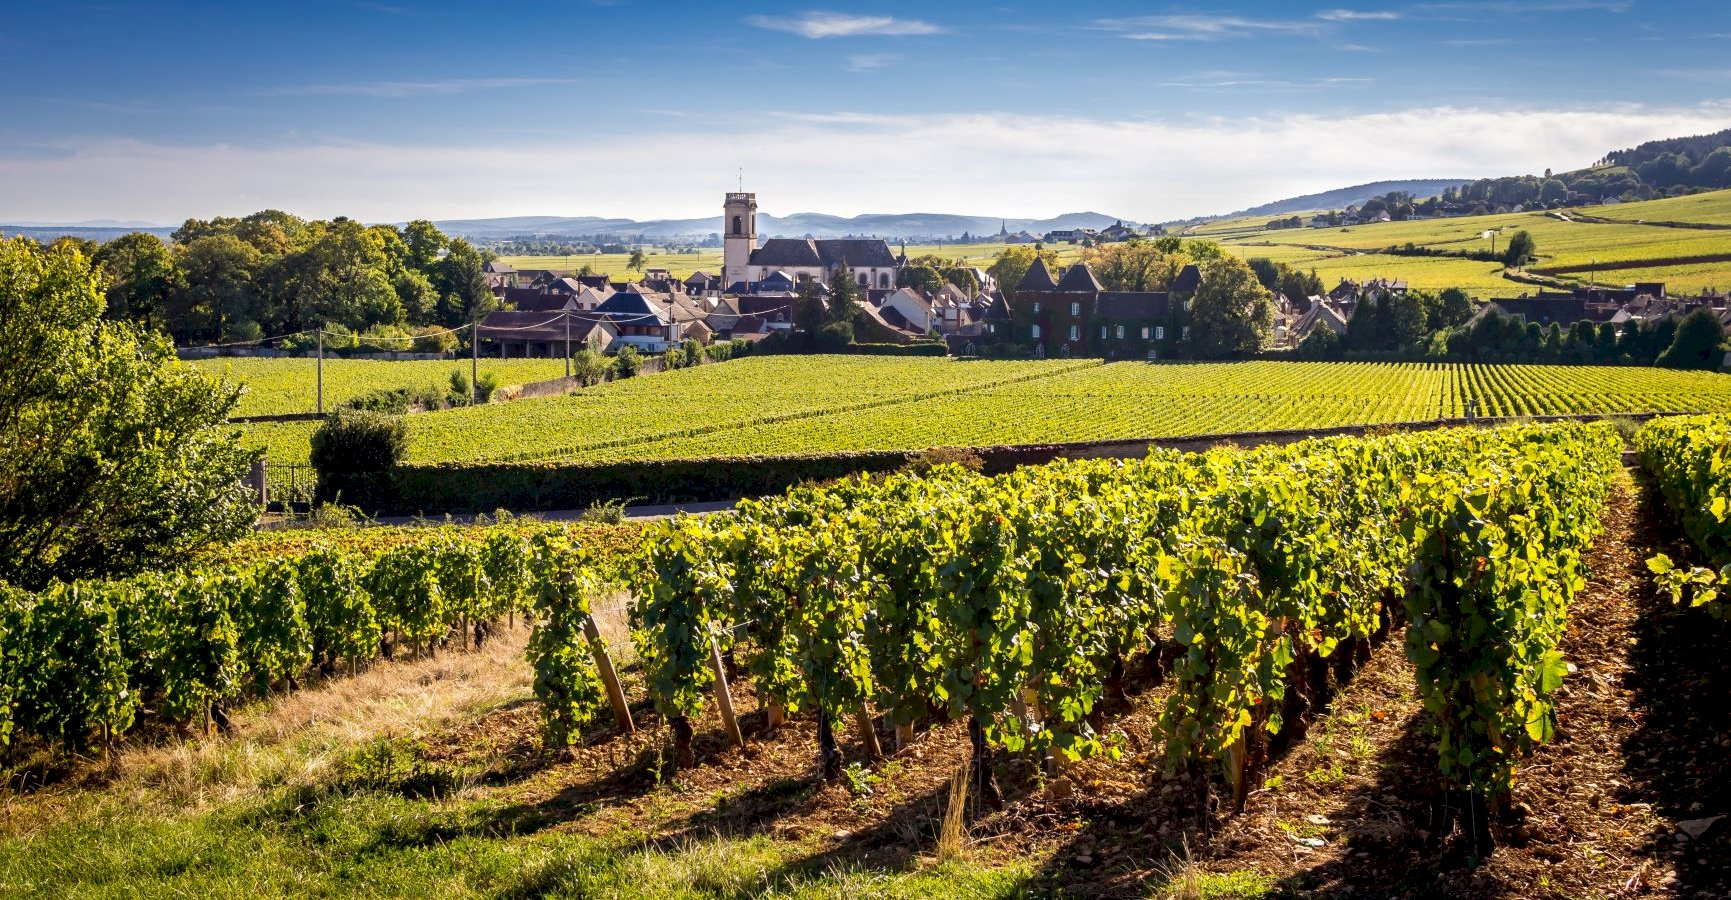 Ophorus Tours - Côte de Beaune Burgundy Wine Tour Private Day Trip From Dijon